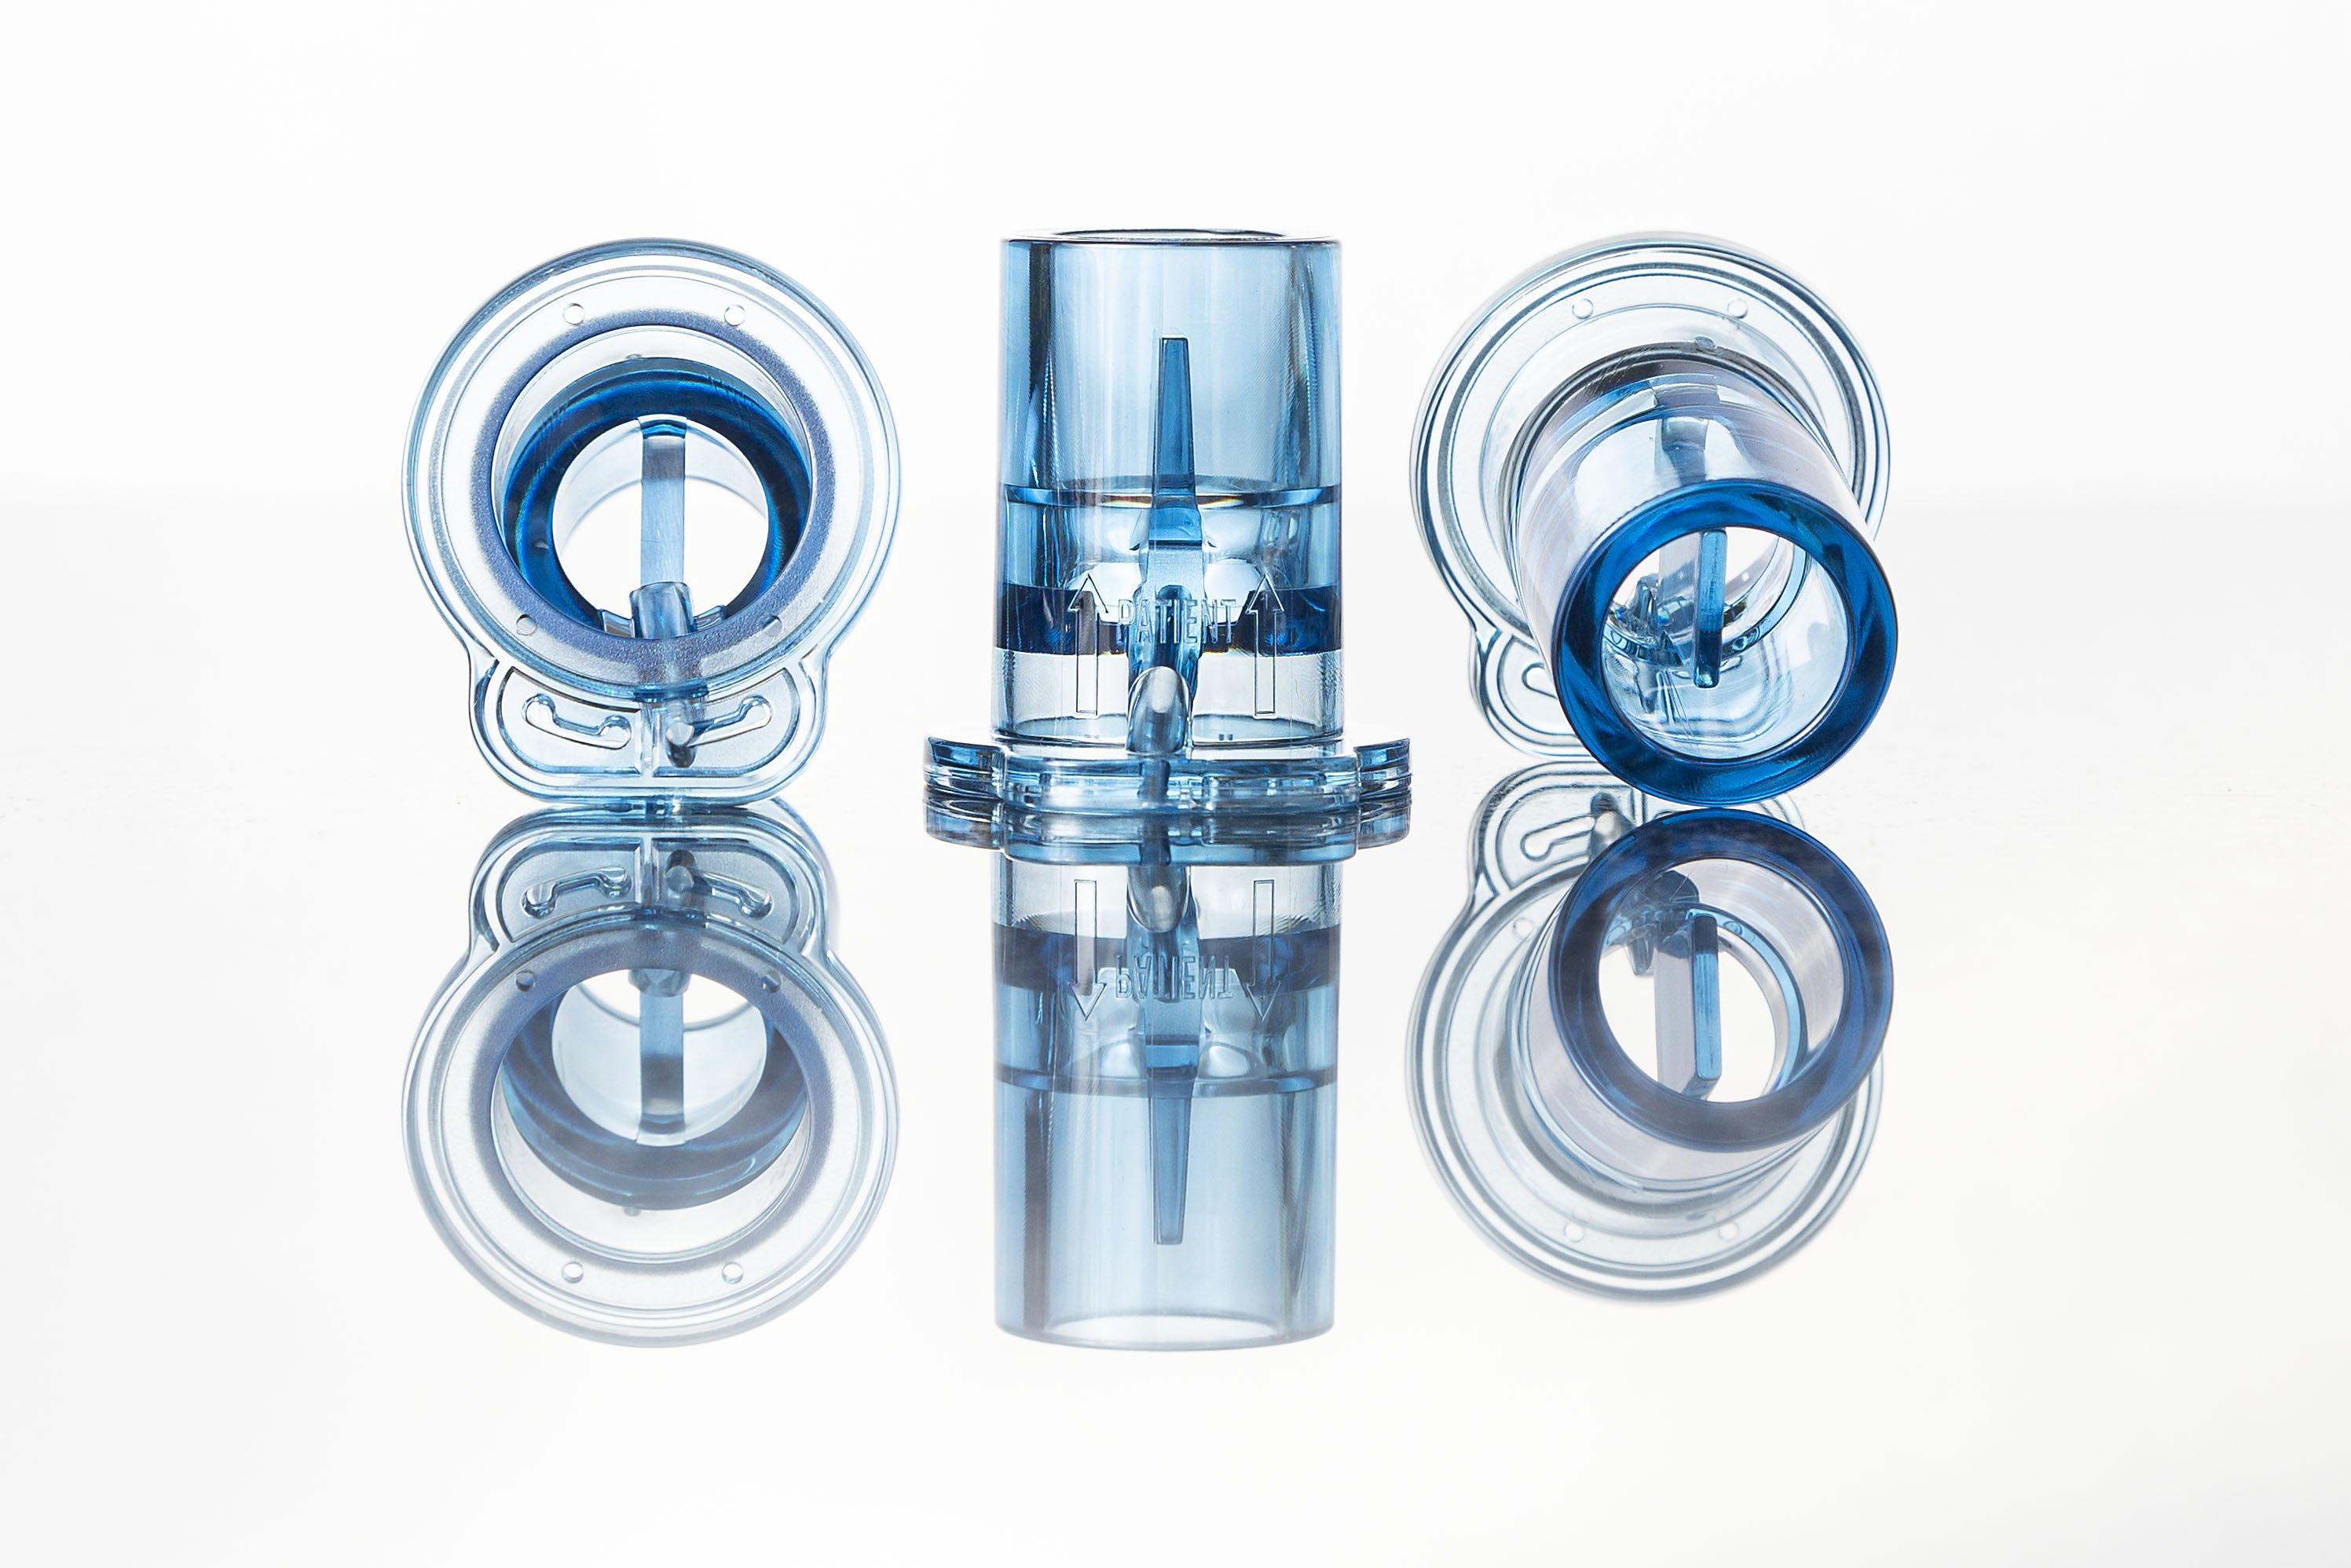 Materiali plastici industria medicale